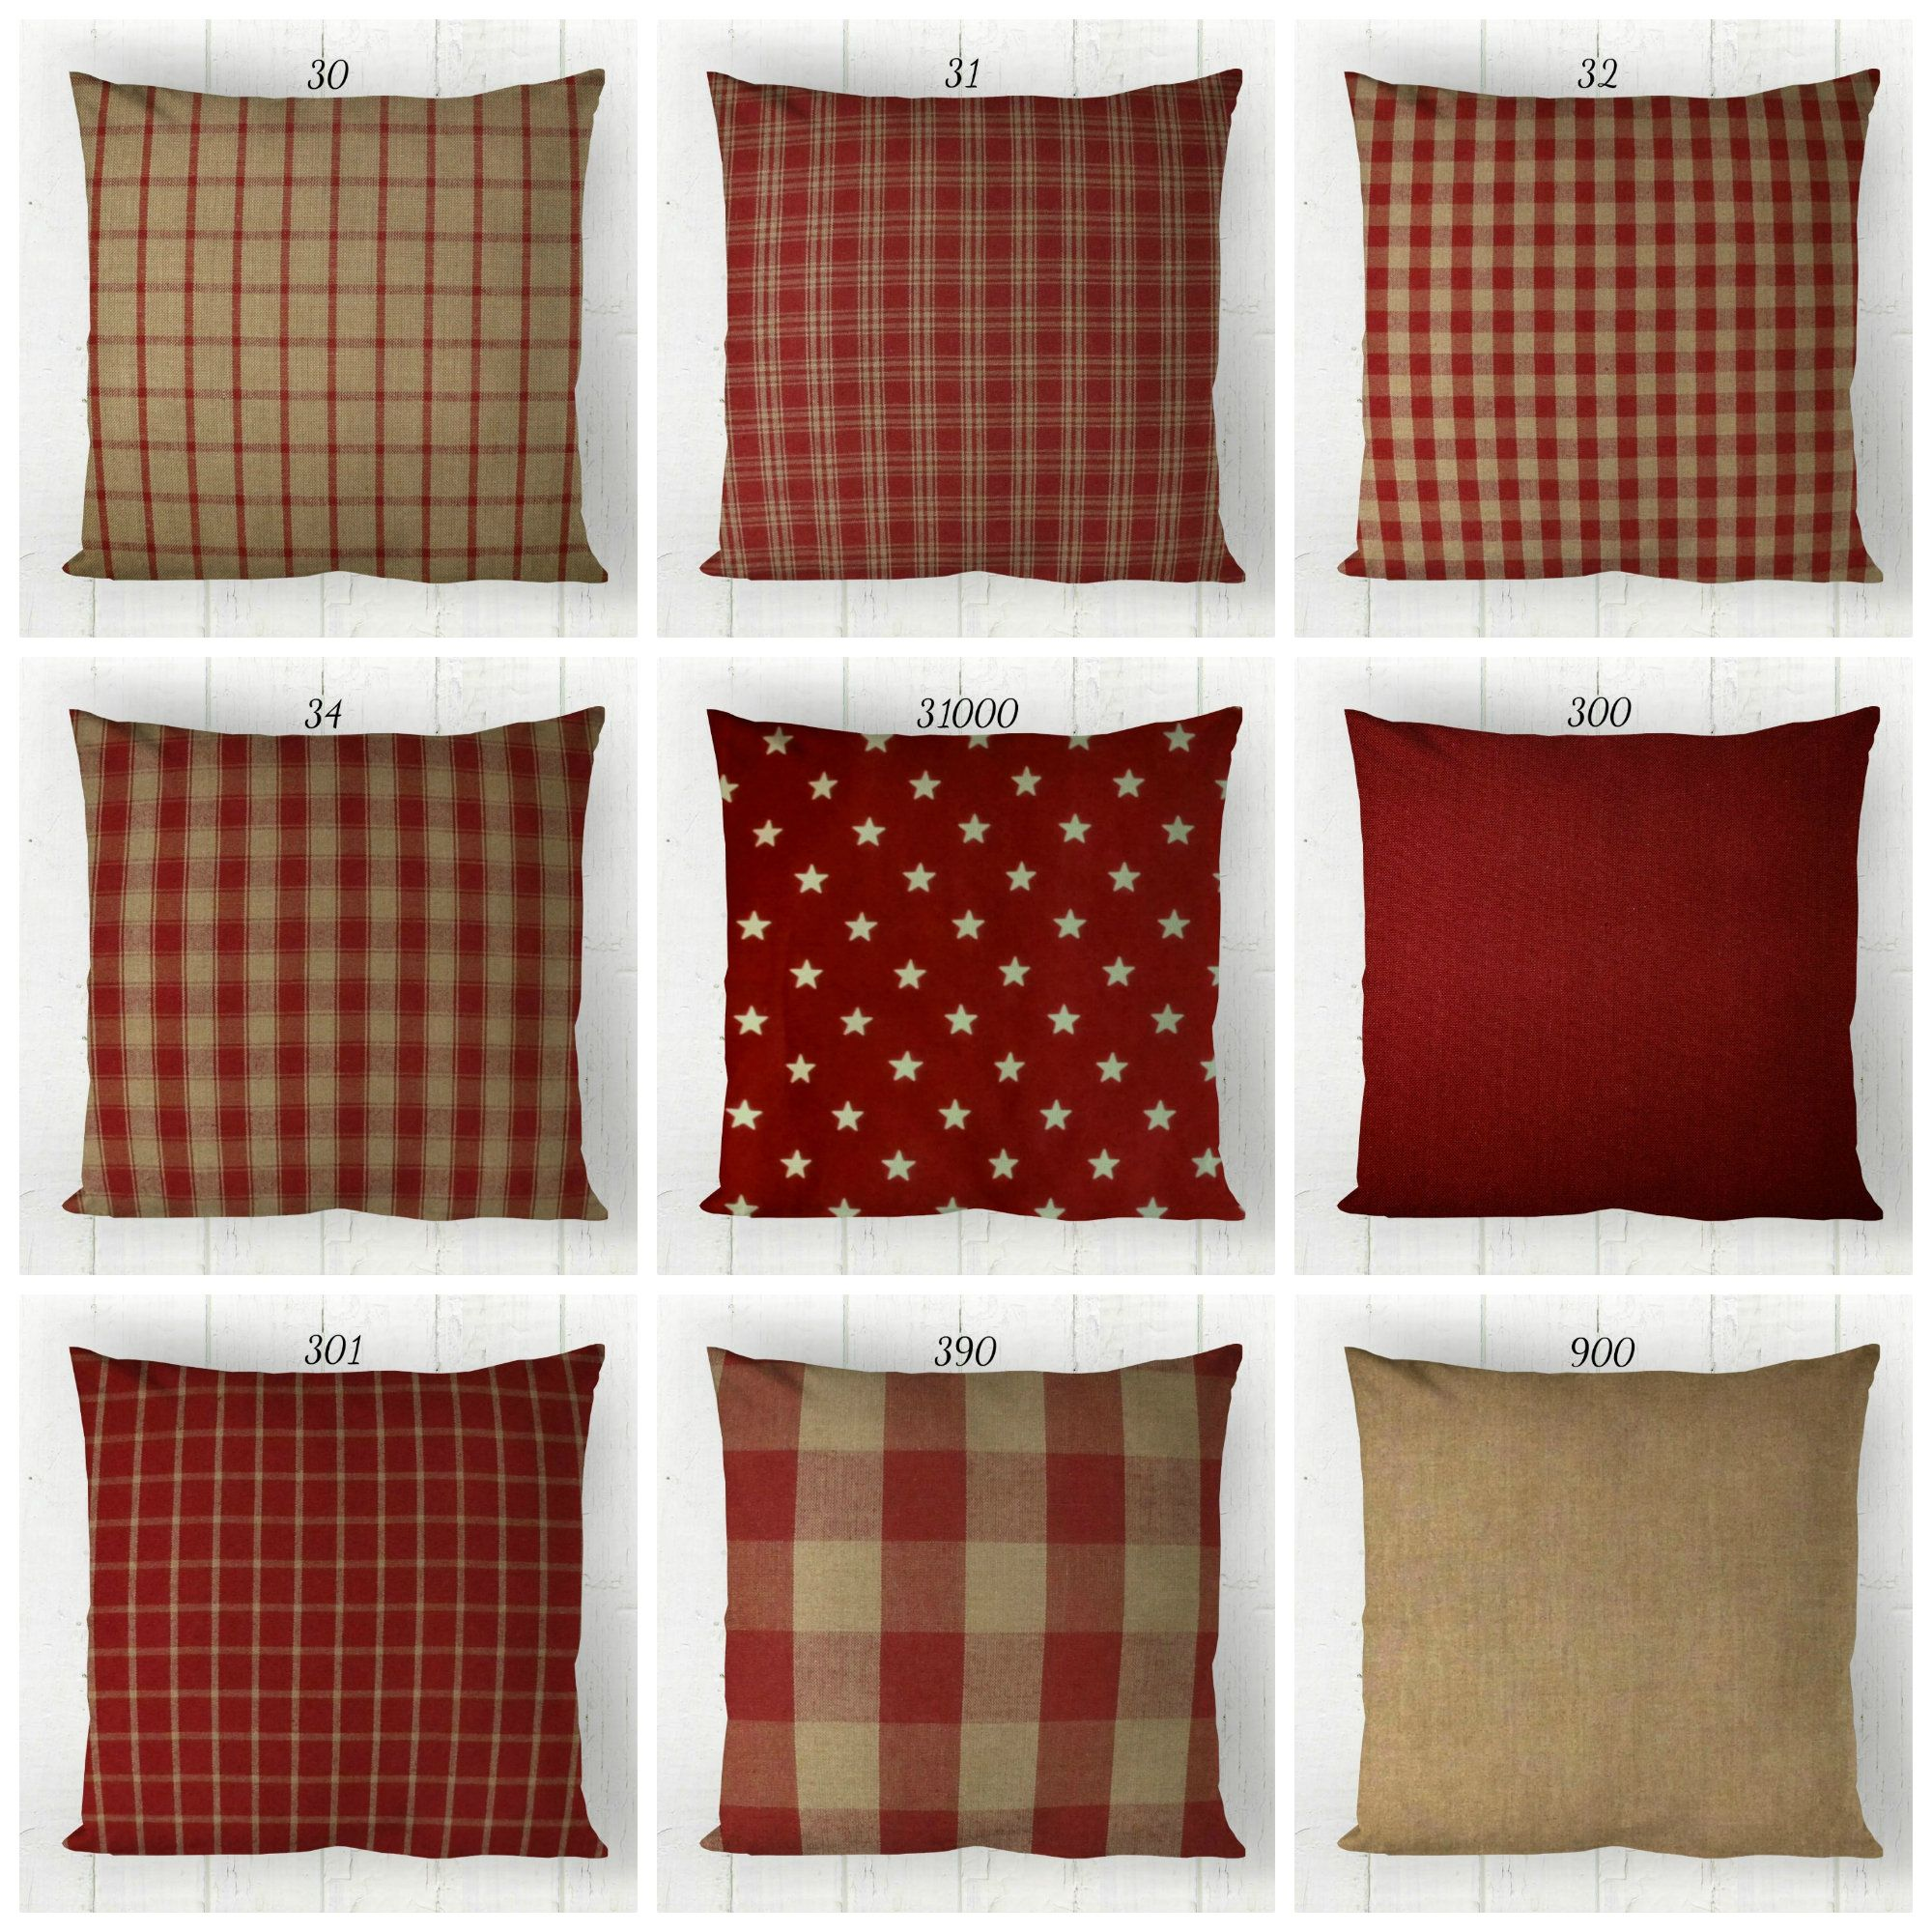 Red Tan Pillow Cover Decorative Farmhouse Throw Pillow Etsy Farmhouse Throw Pillow Pillow Covers Throw Pillow Etsy